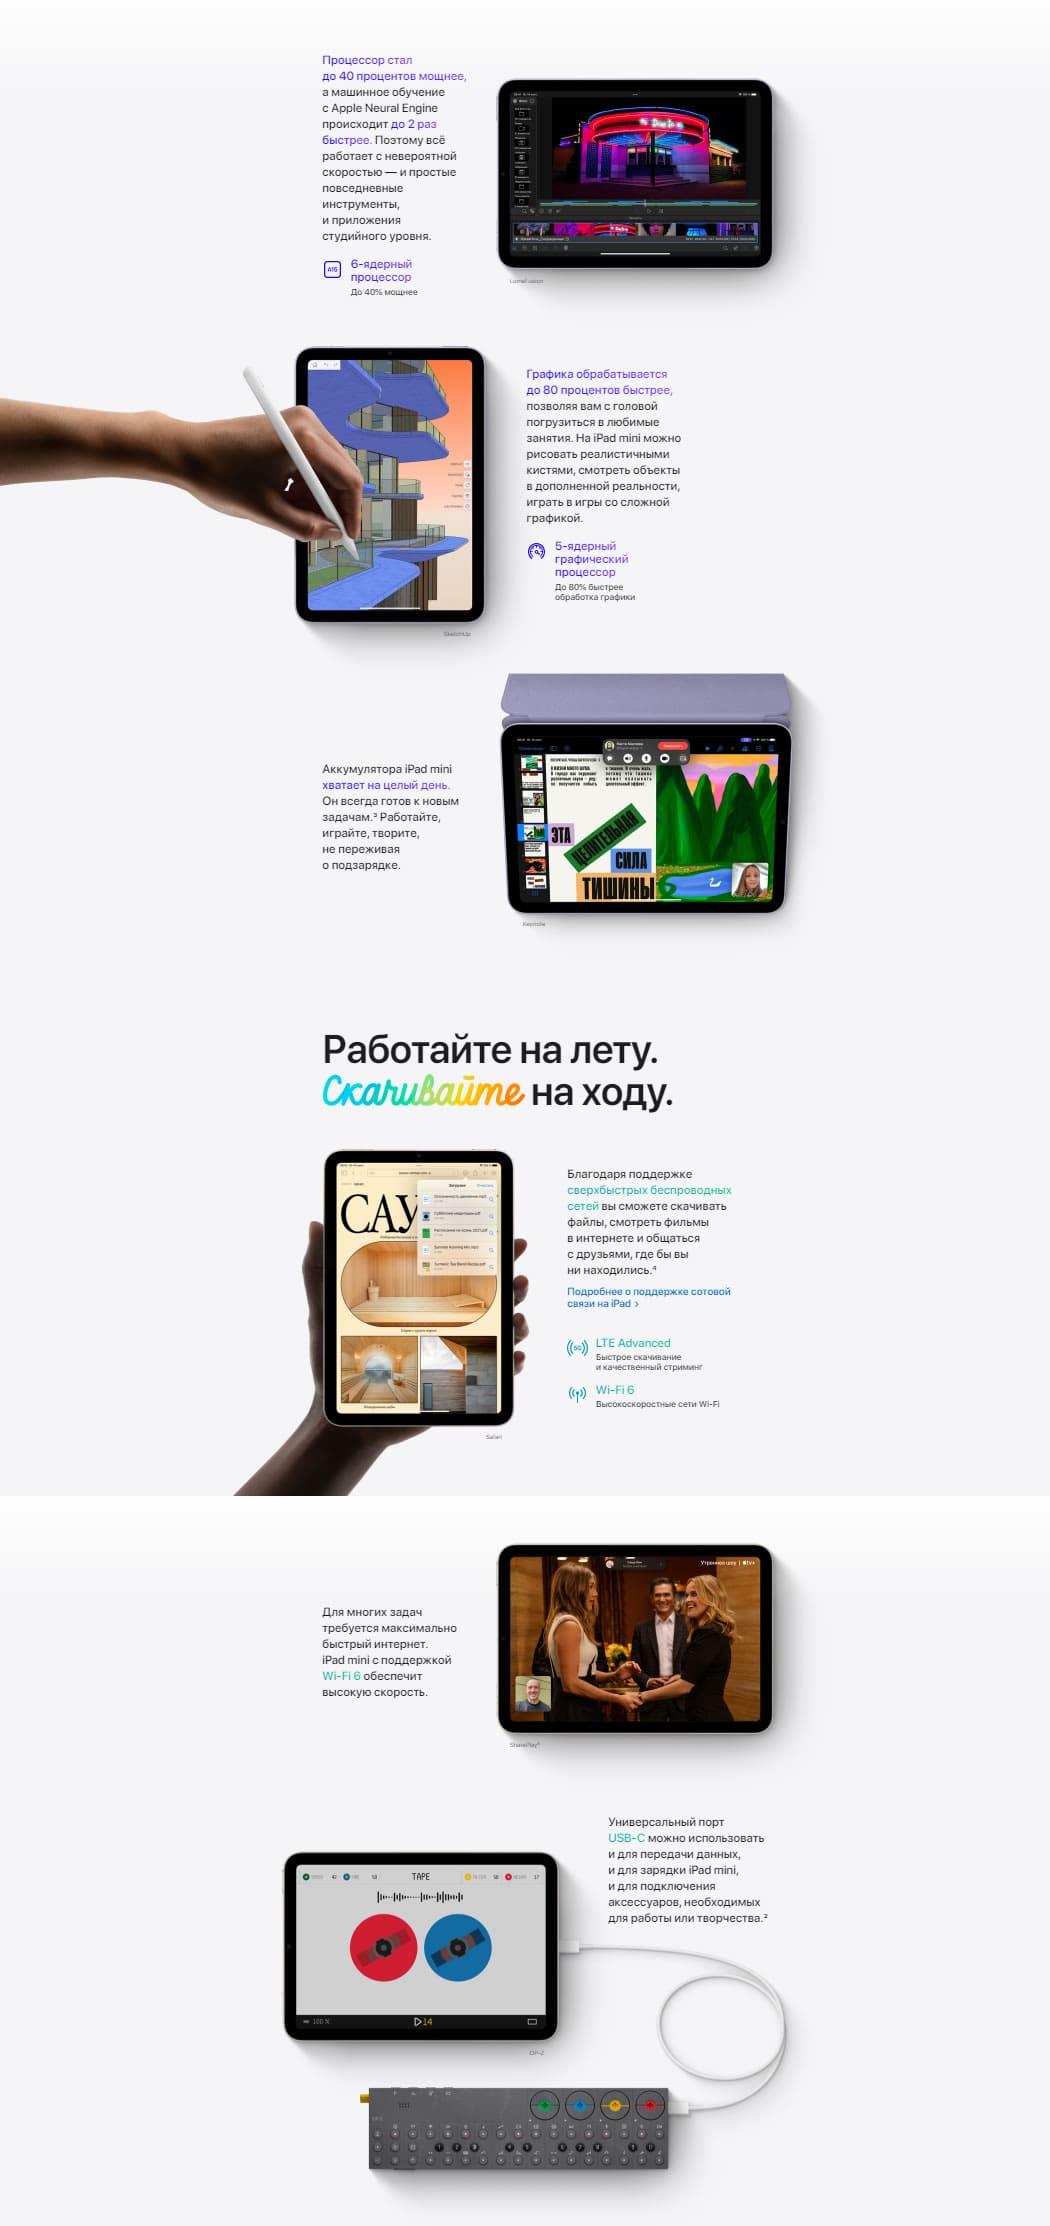 iPad mini 2021 характеристики